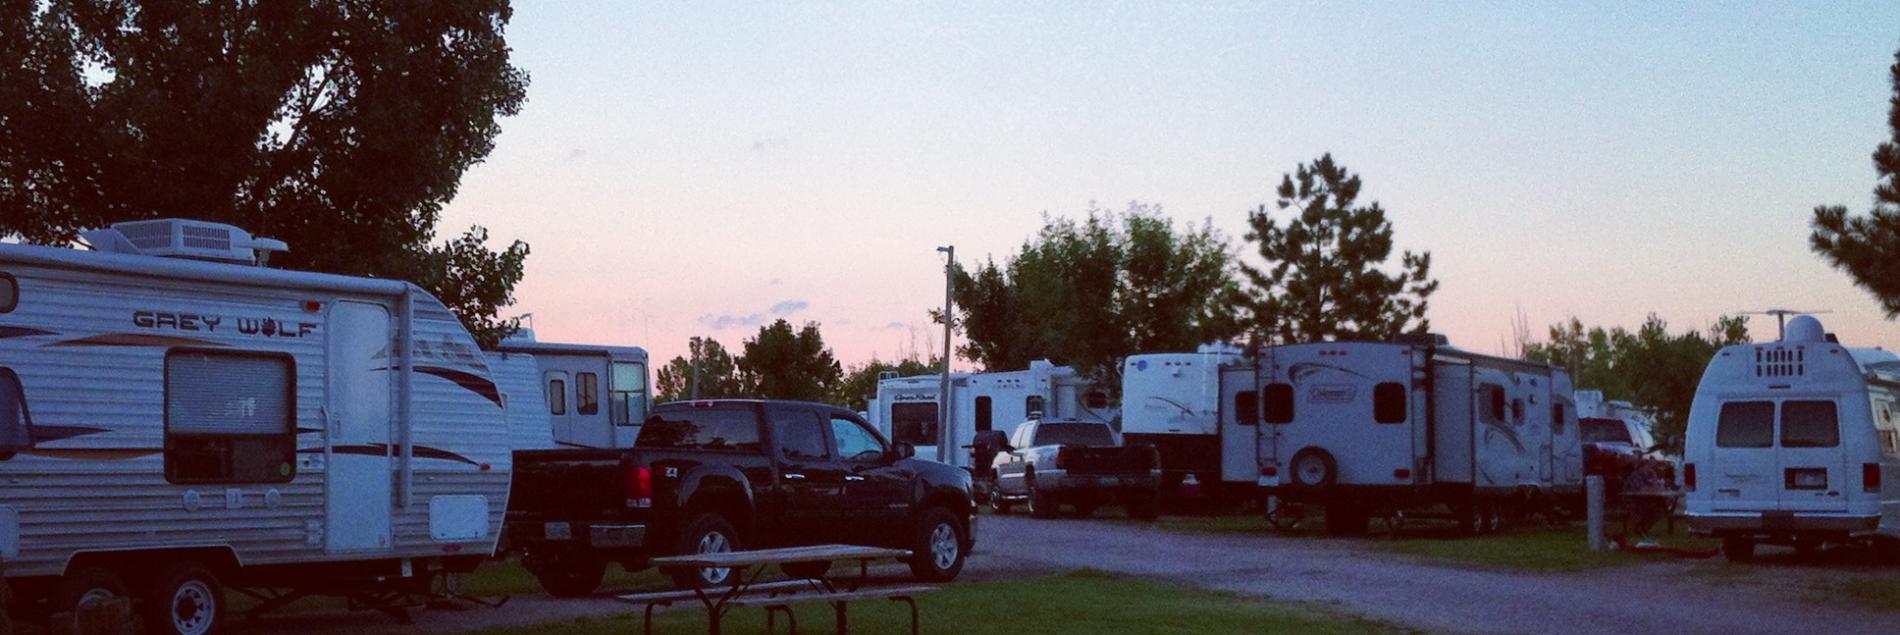 Sleepy Hollow RV Park & Campground